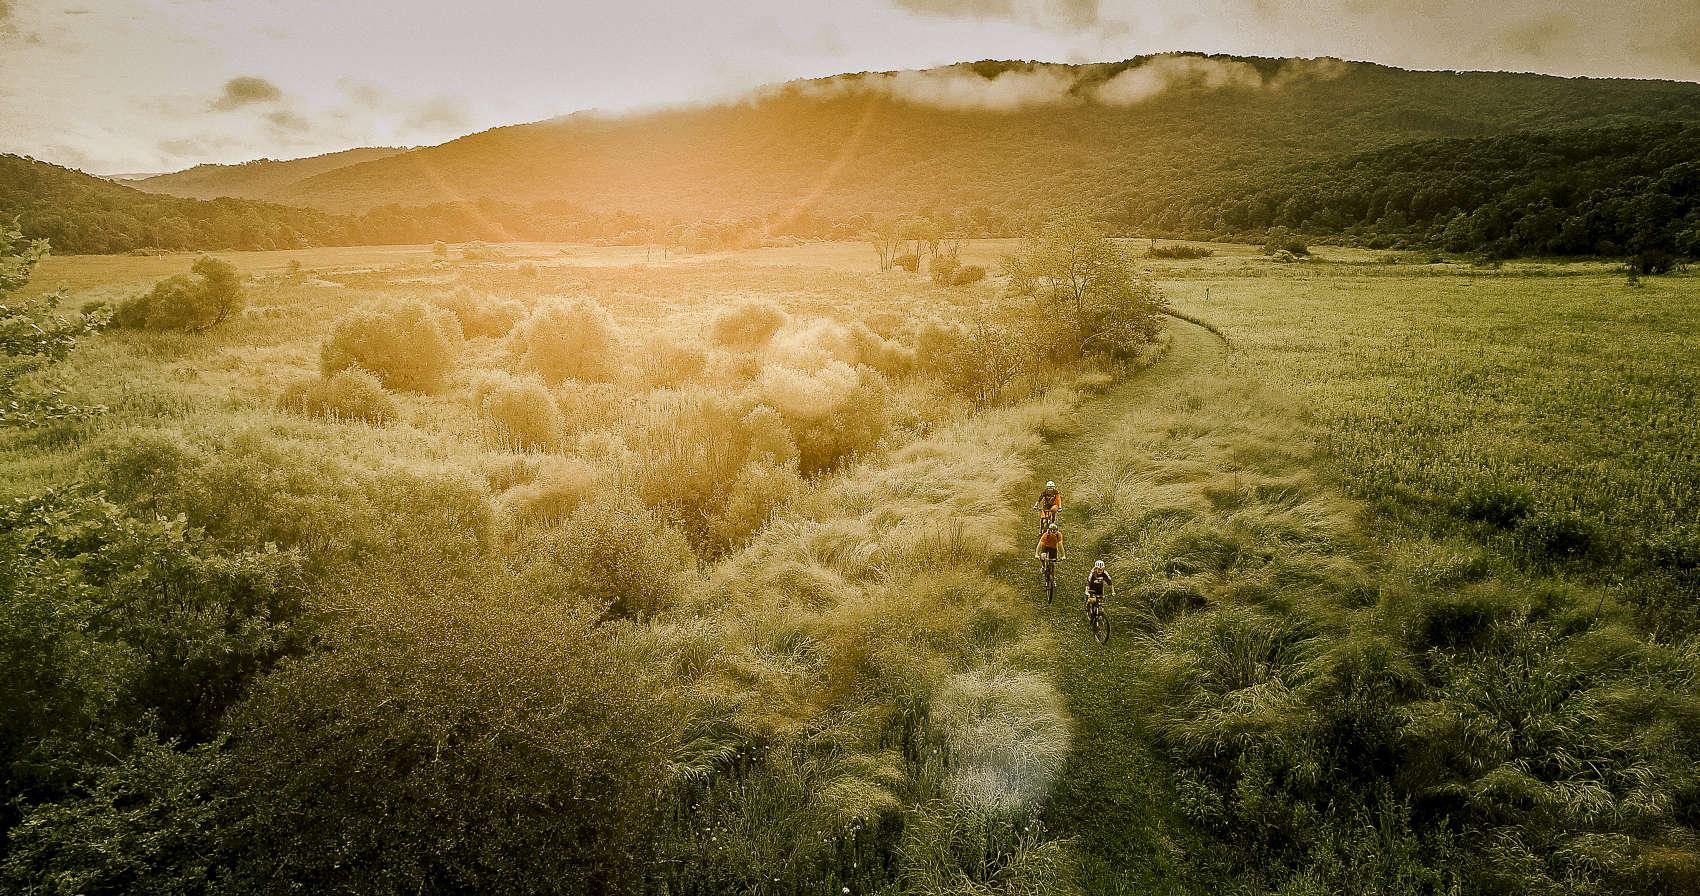 072915-virginia-mountain-biking-adventure-photographer-dean